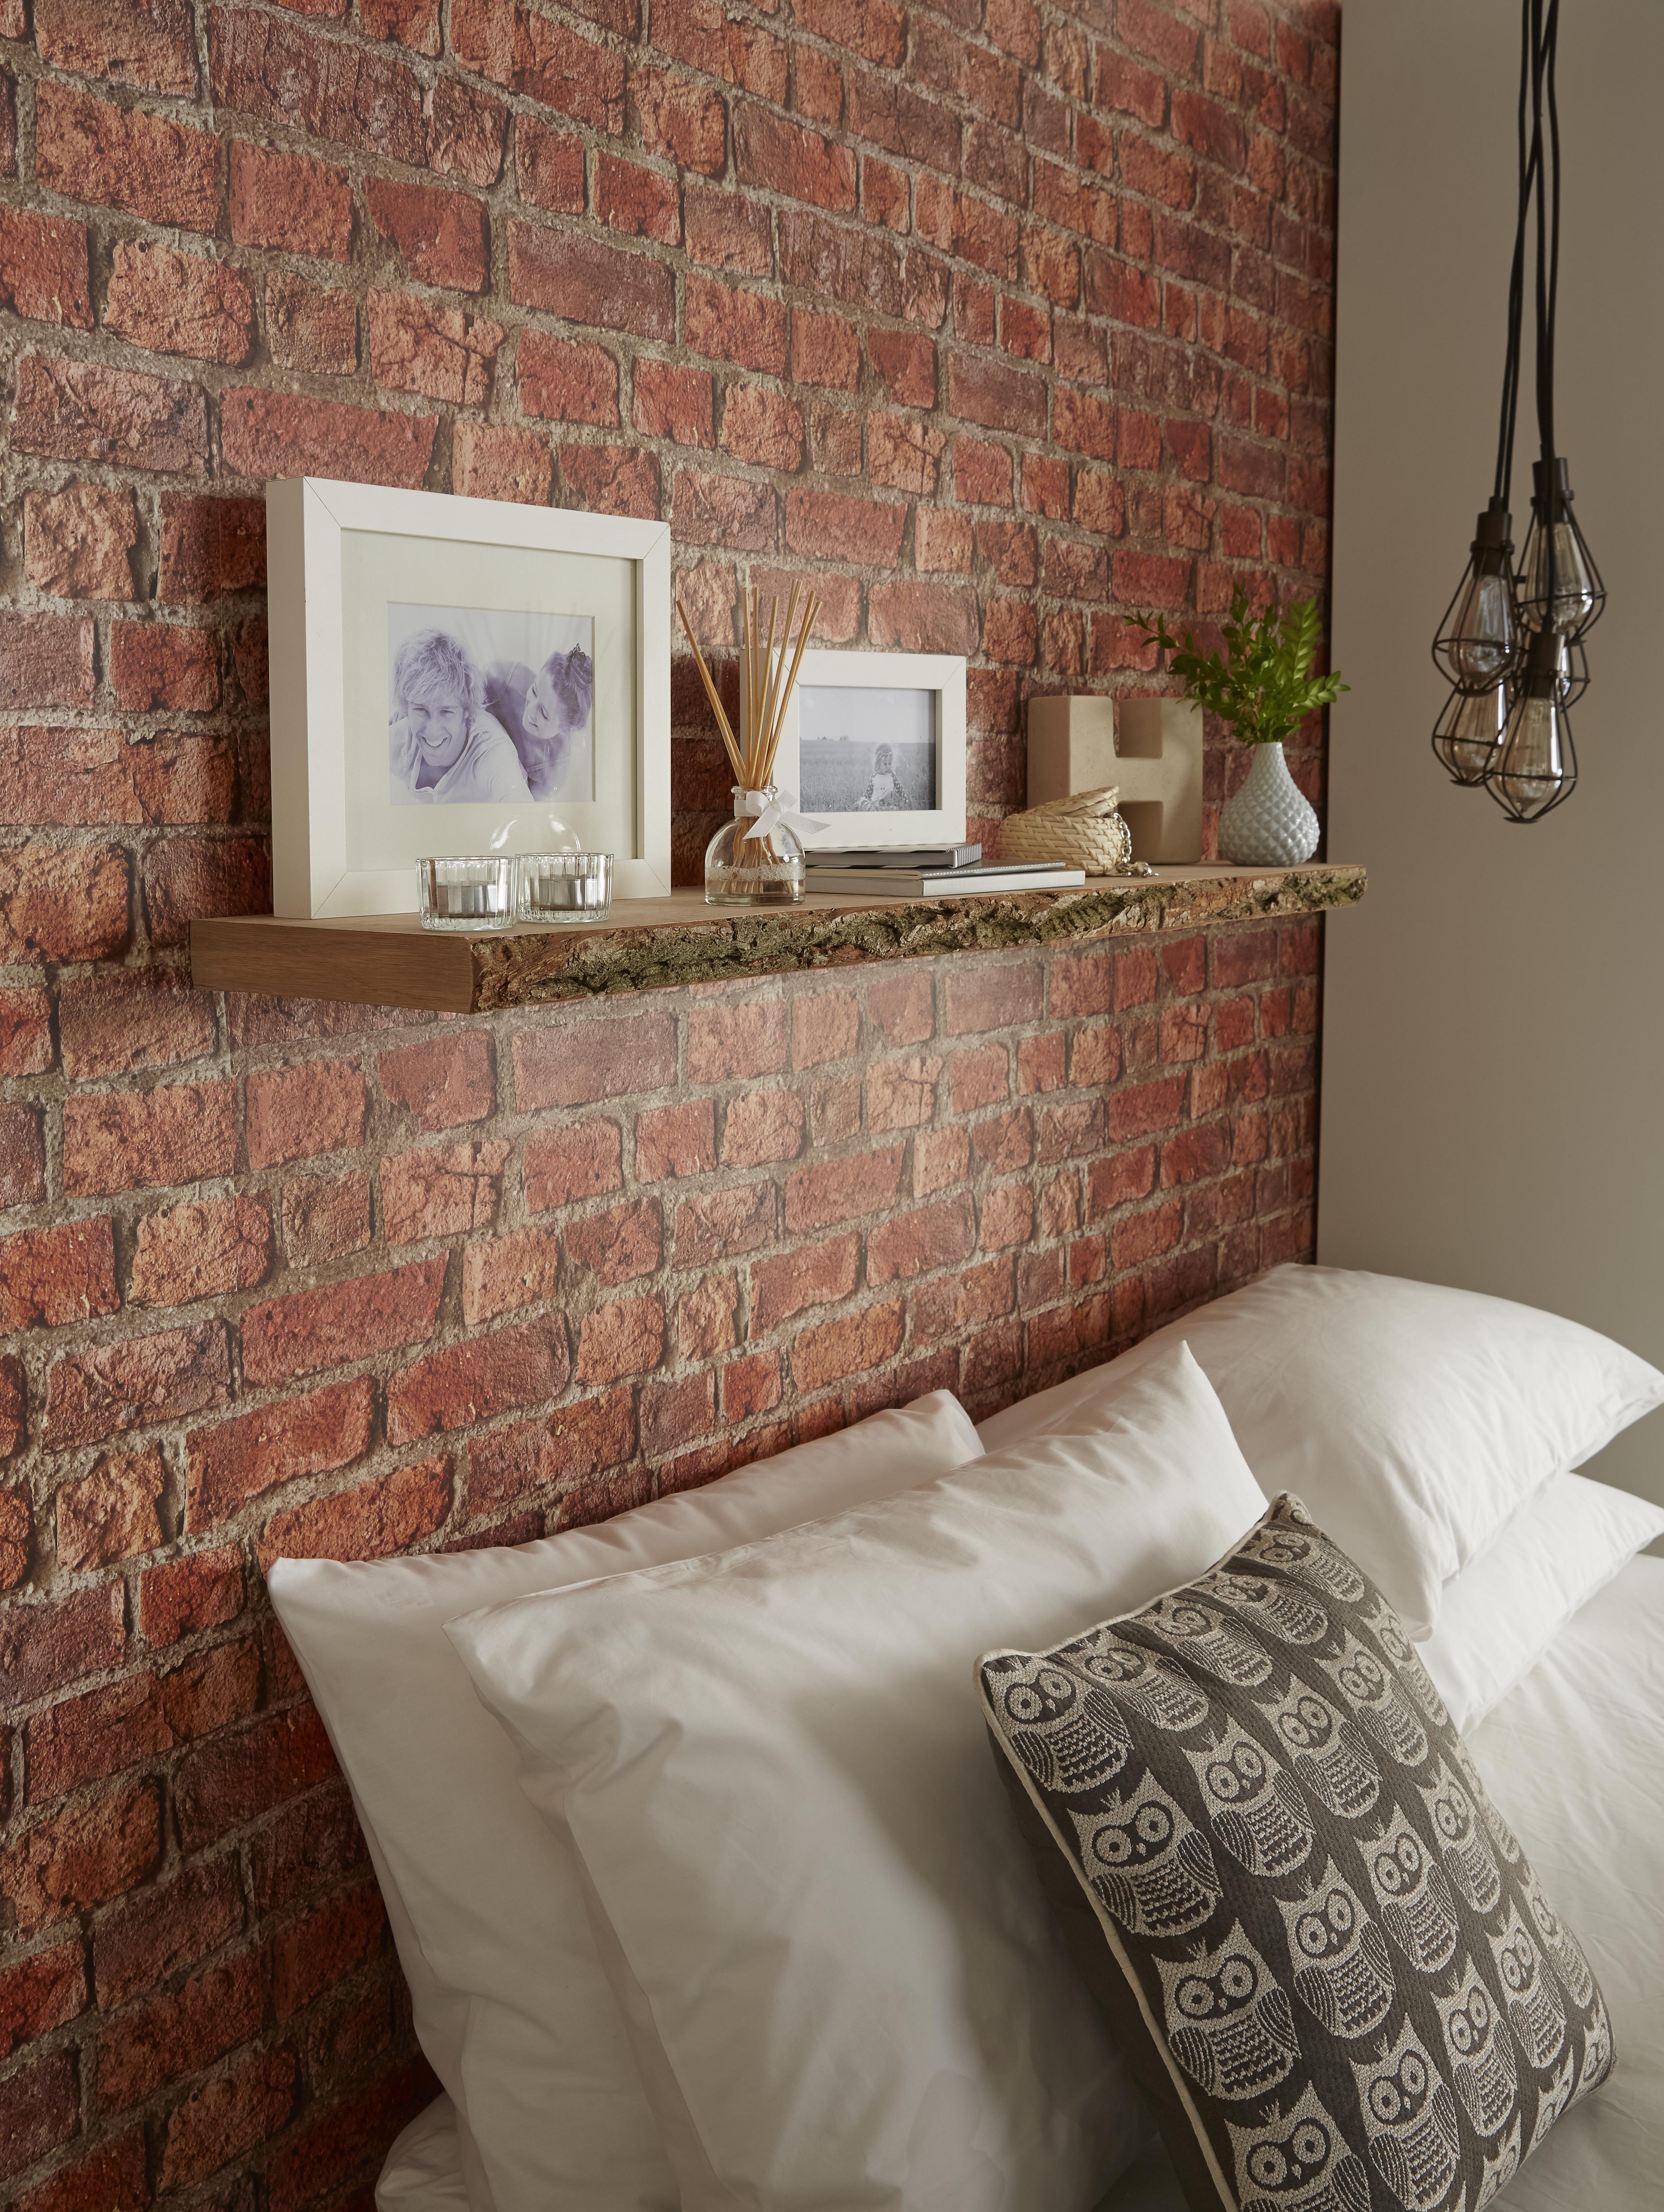 how to put up a shelf ideas advice diy at b q rh diy com floating shelves bar floating shelves below tv